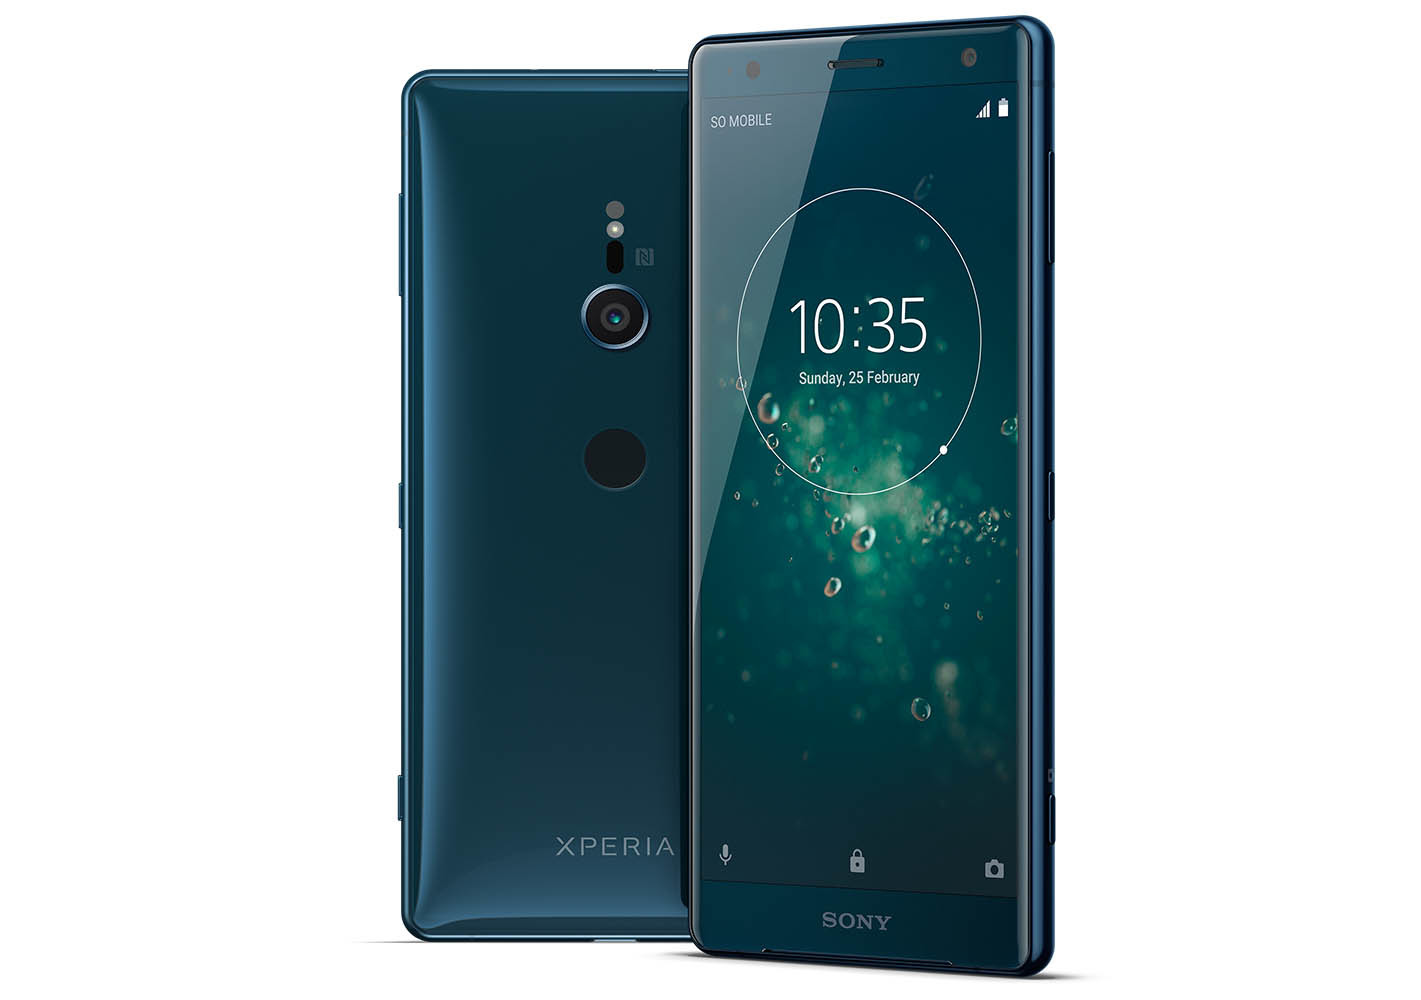 H8266/G смартфон Sony Xperia XZ2, цвет Темный изумруд